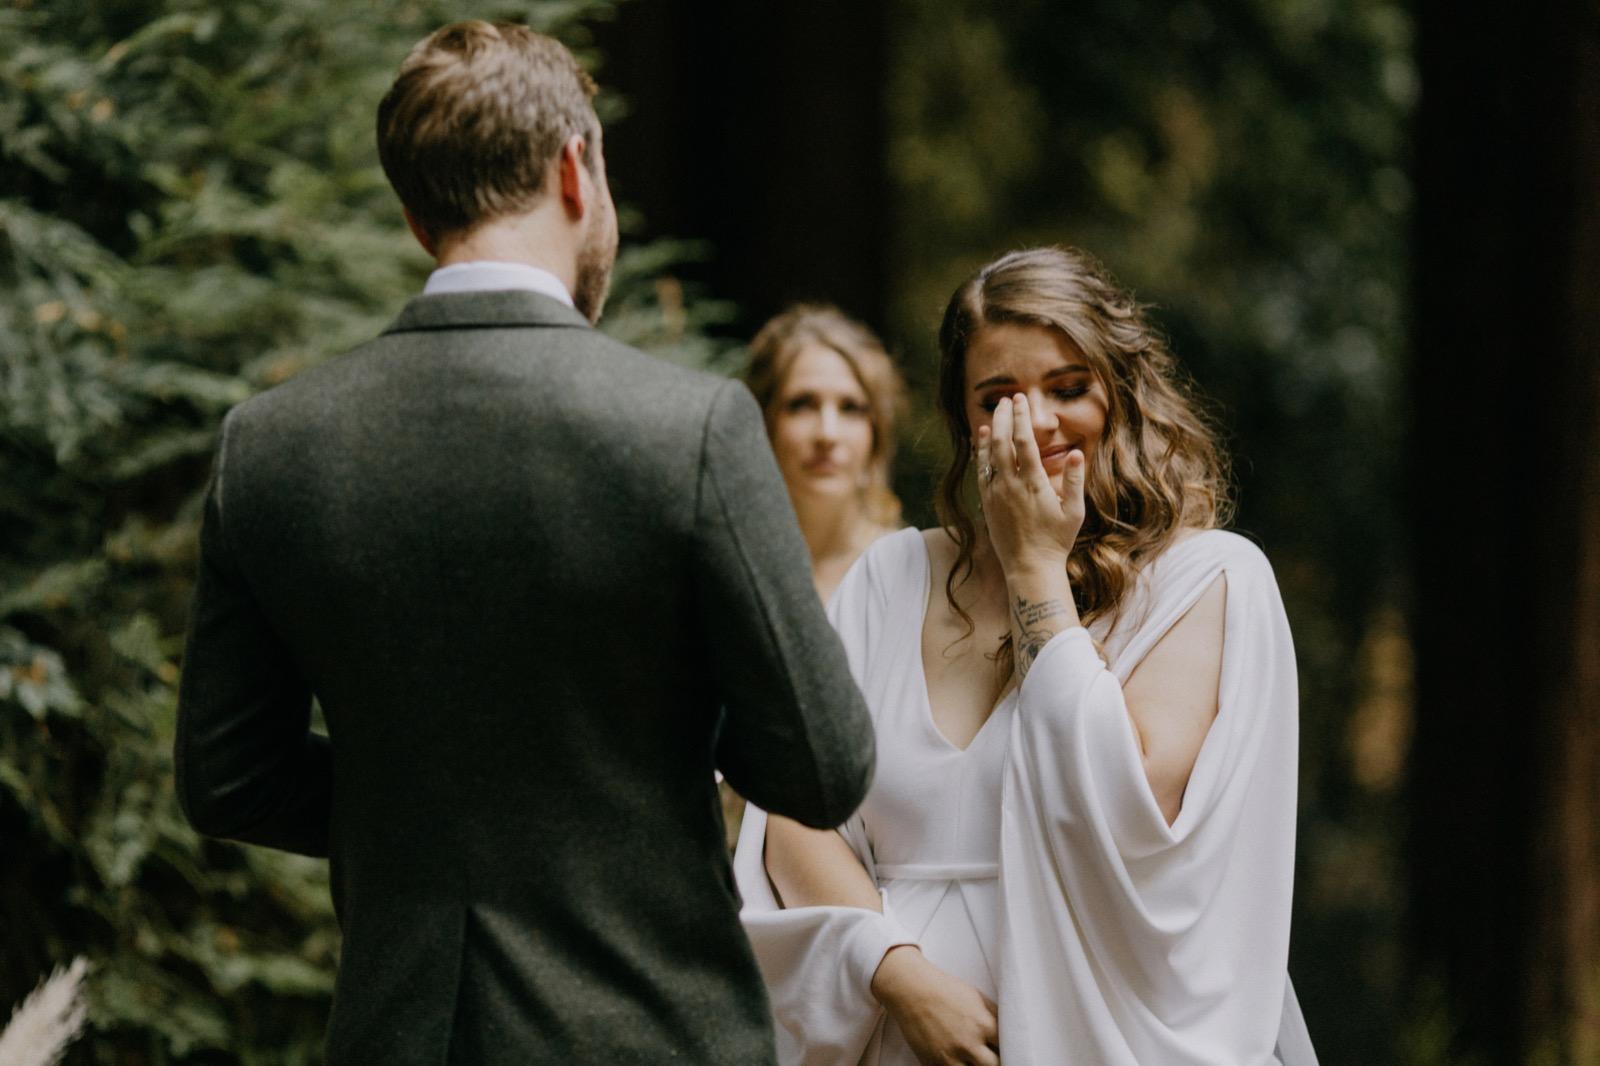 075_Emily & Jeff Wedding 0699_the-waterfall-lodge_forest_wedding_ben-lomond_intimate